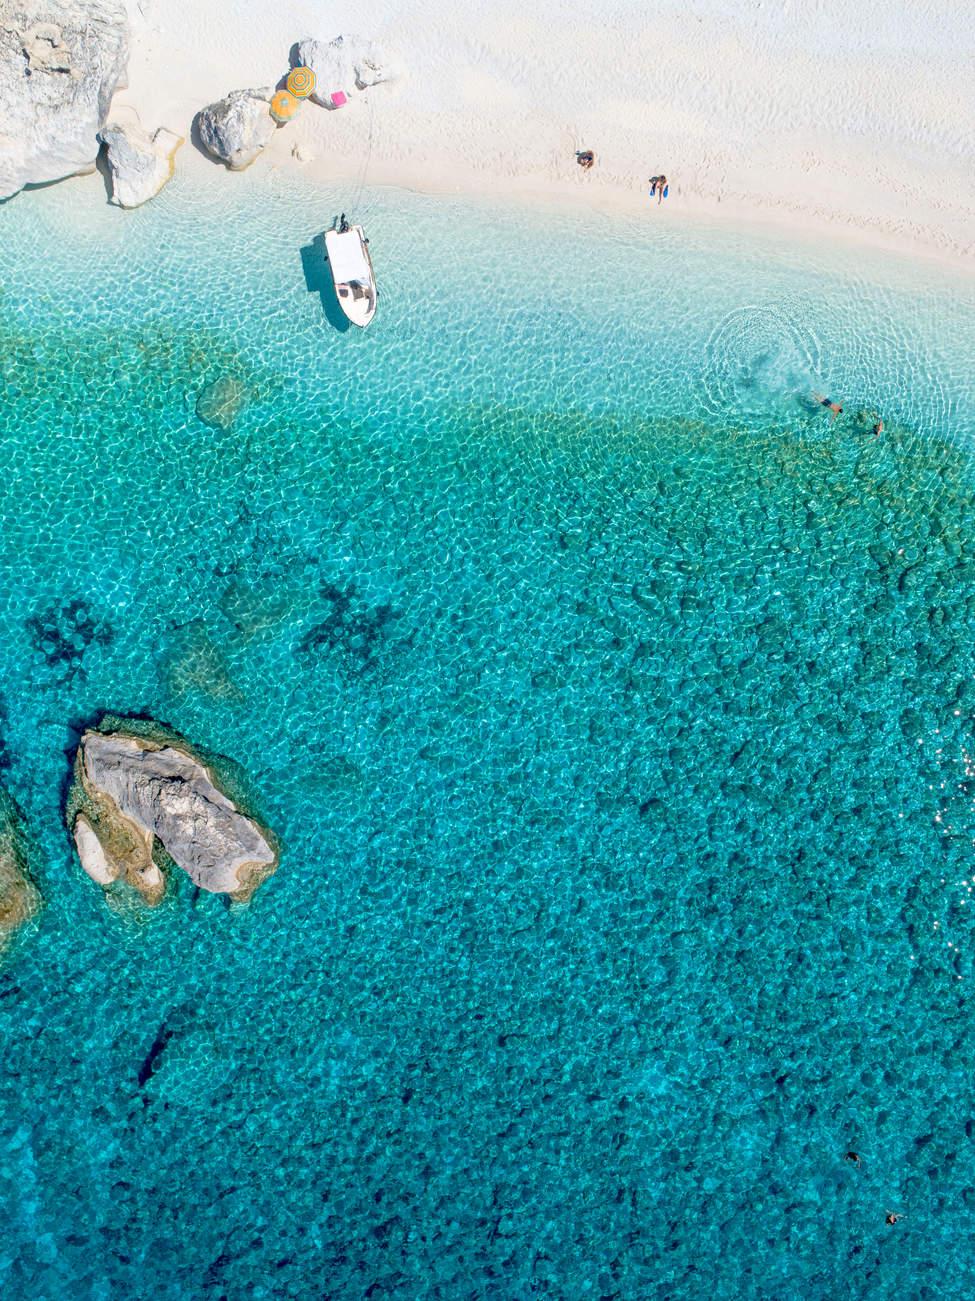 'Simple Things', Calypso Beach, Othonoi, Greece